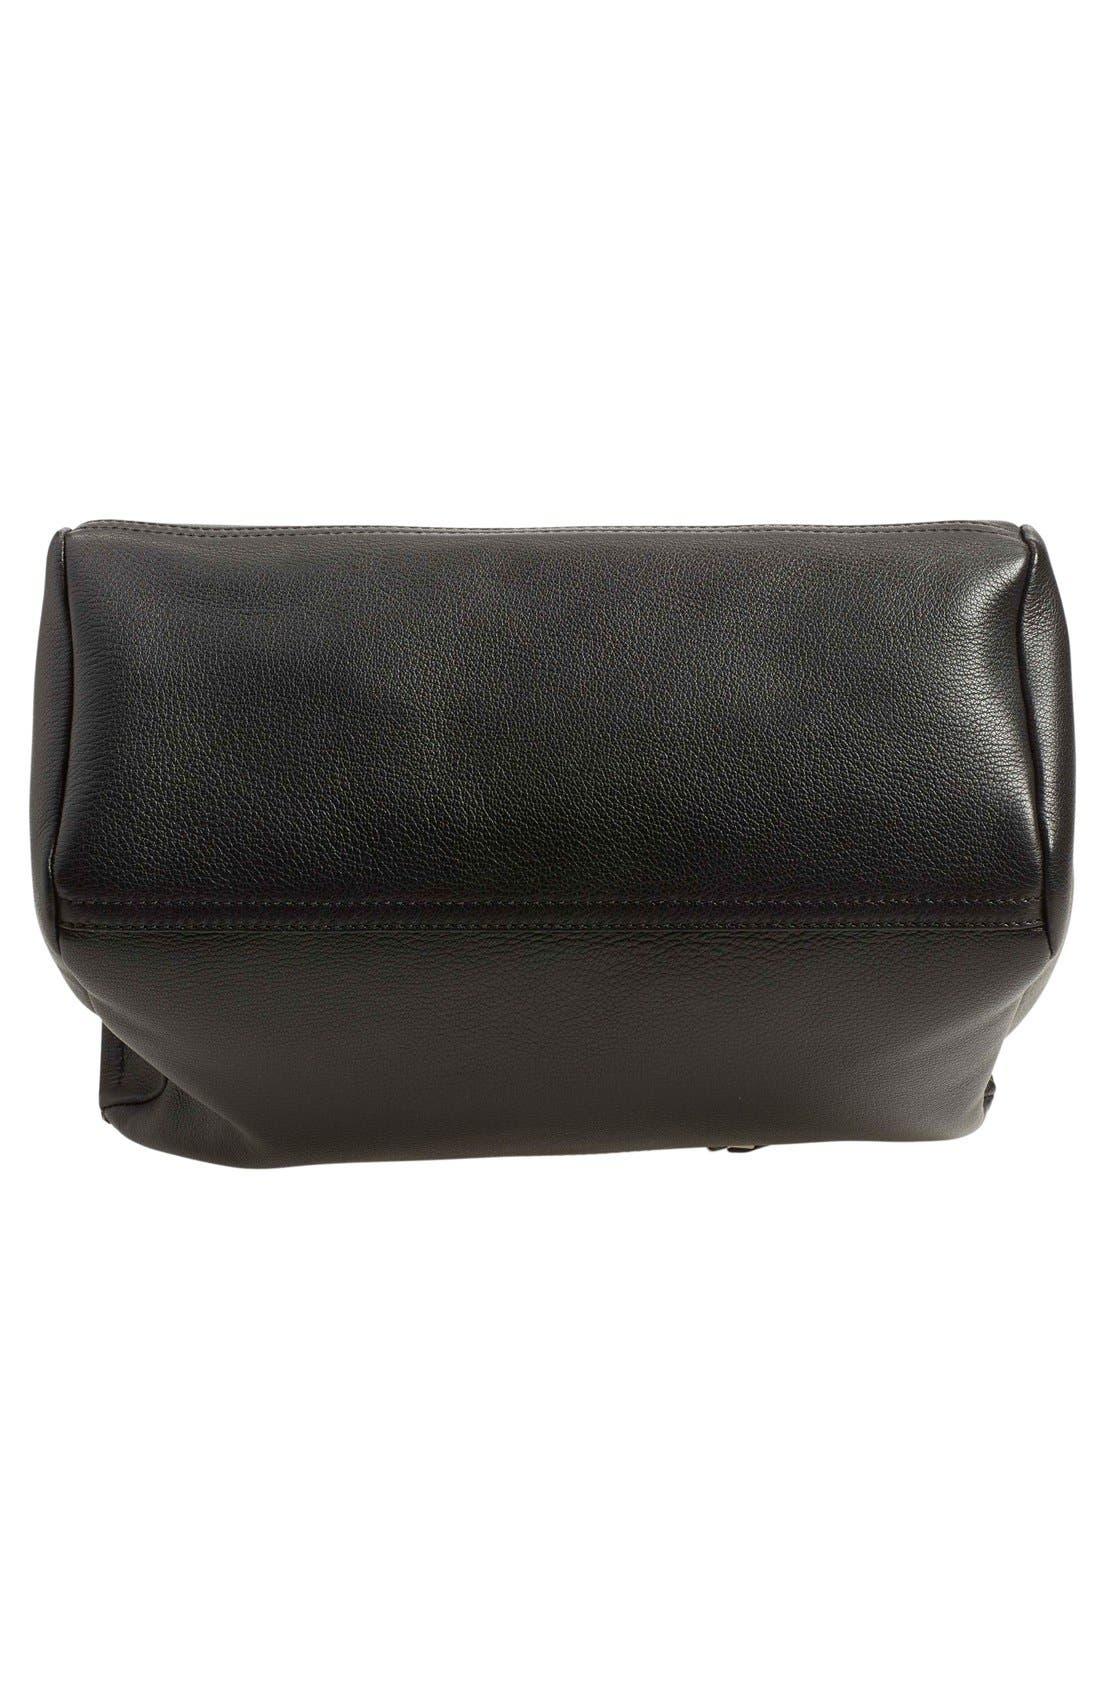 'Medium Pandora' Sugar Leather Satchel,                             Alternate thumbnail 6, color,                             Black